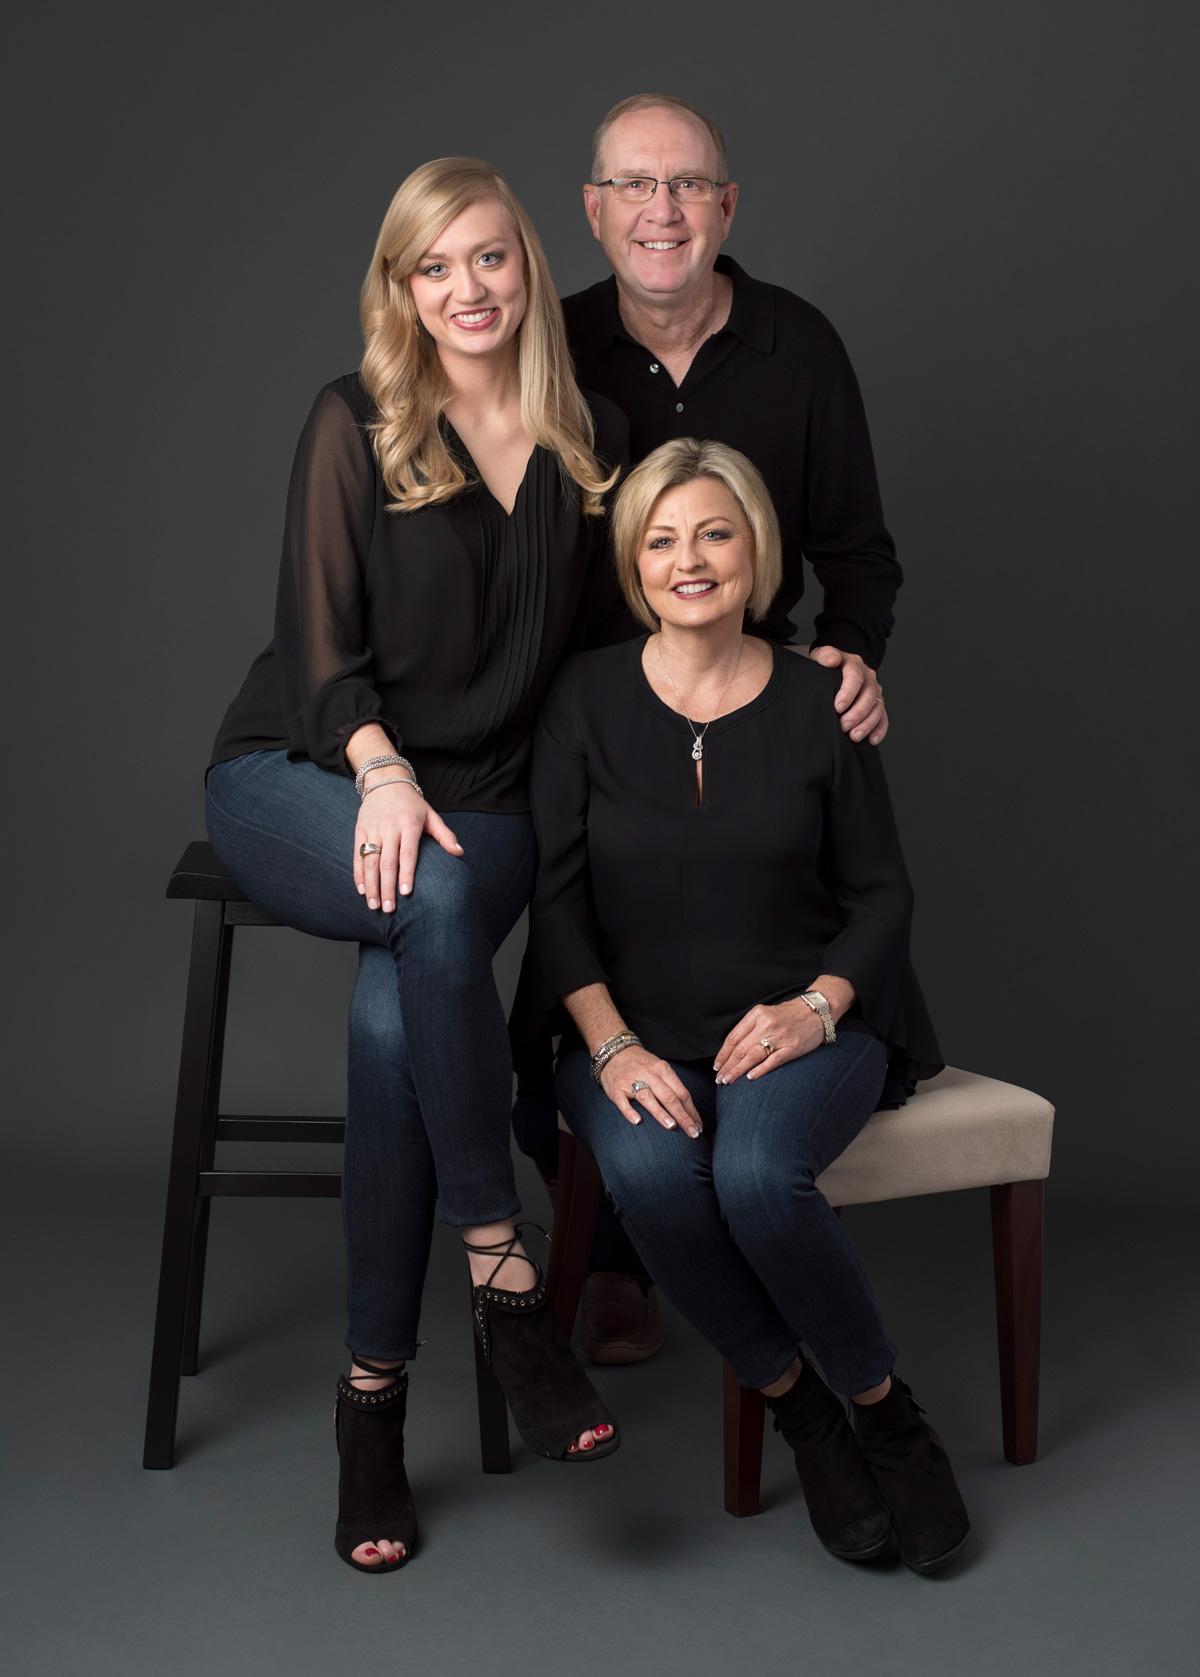 Heights-Studio-Family-Portraits (1).jpg